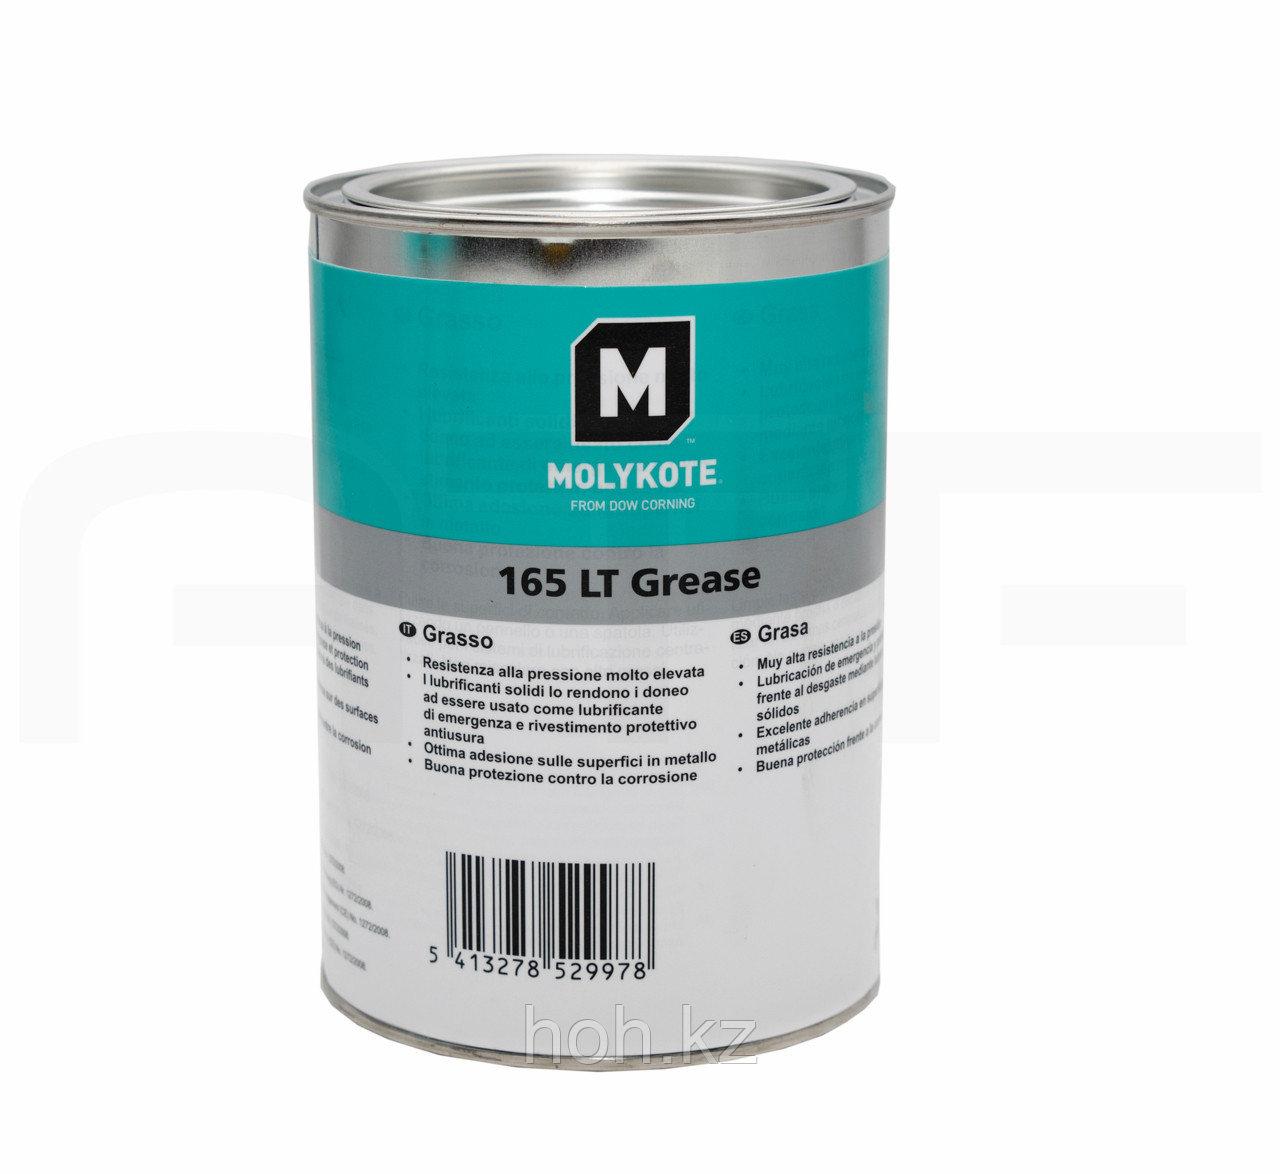 Molykote 165 LT Пластичная смазка EP 2-3